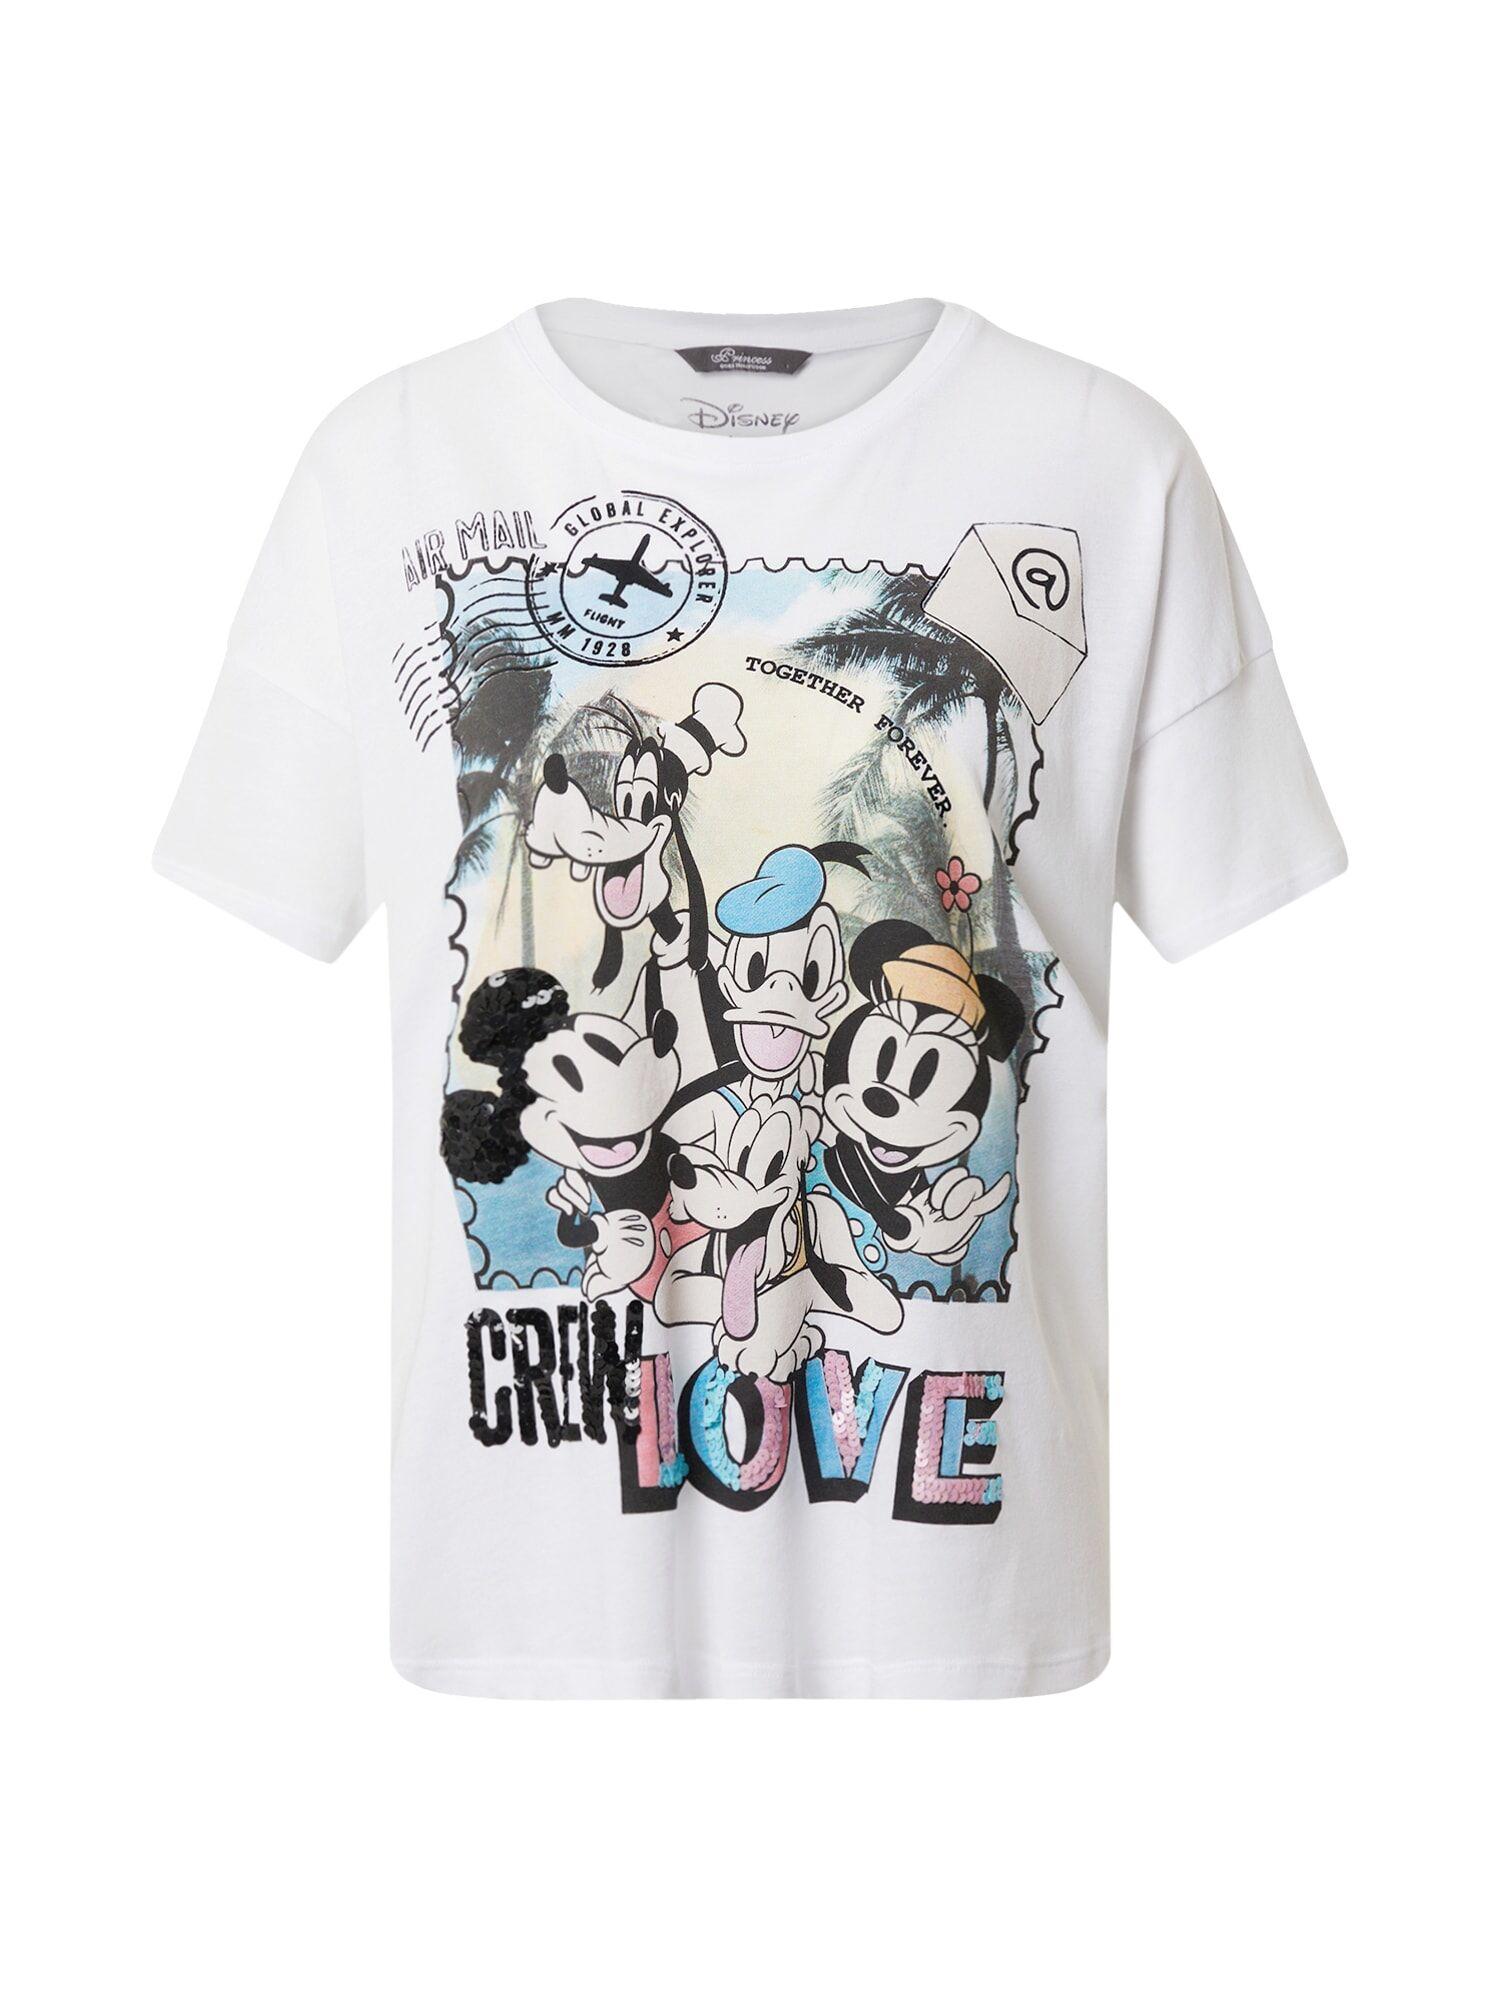 Princess T-shirt 'Disney Crew Love'  - Blanc - Taille: 42 - female